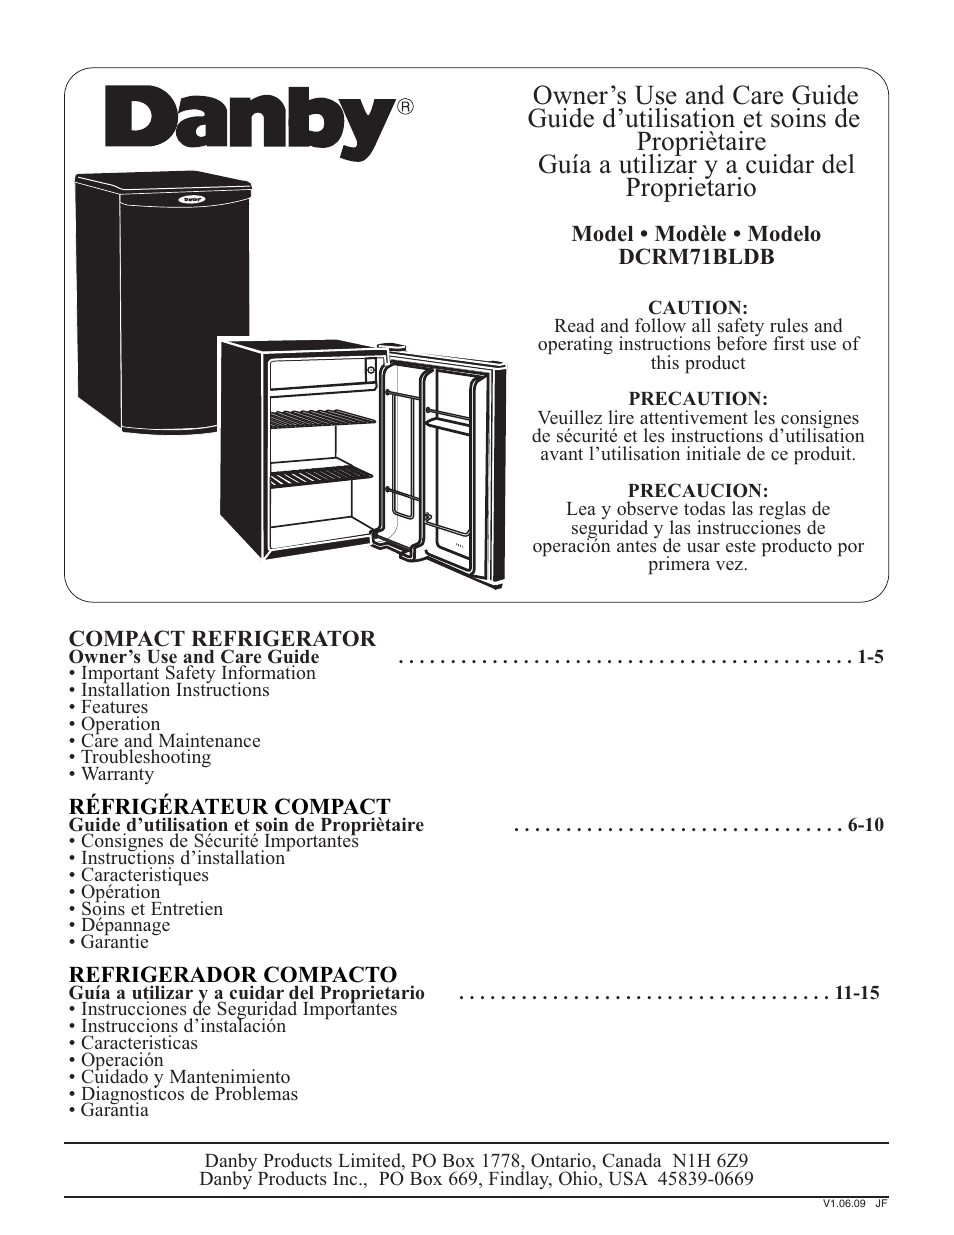 Danby syff123c1wl user manual | page 2 / 32 | original mode | also.